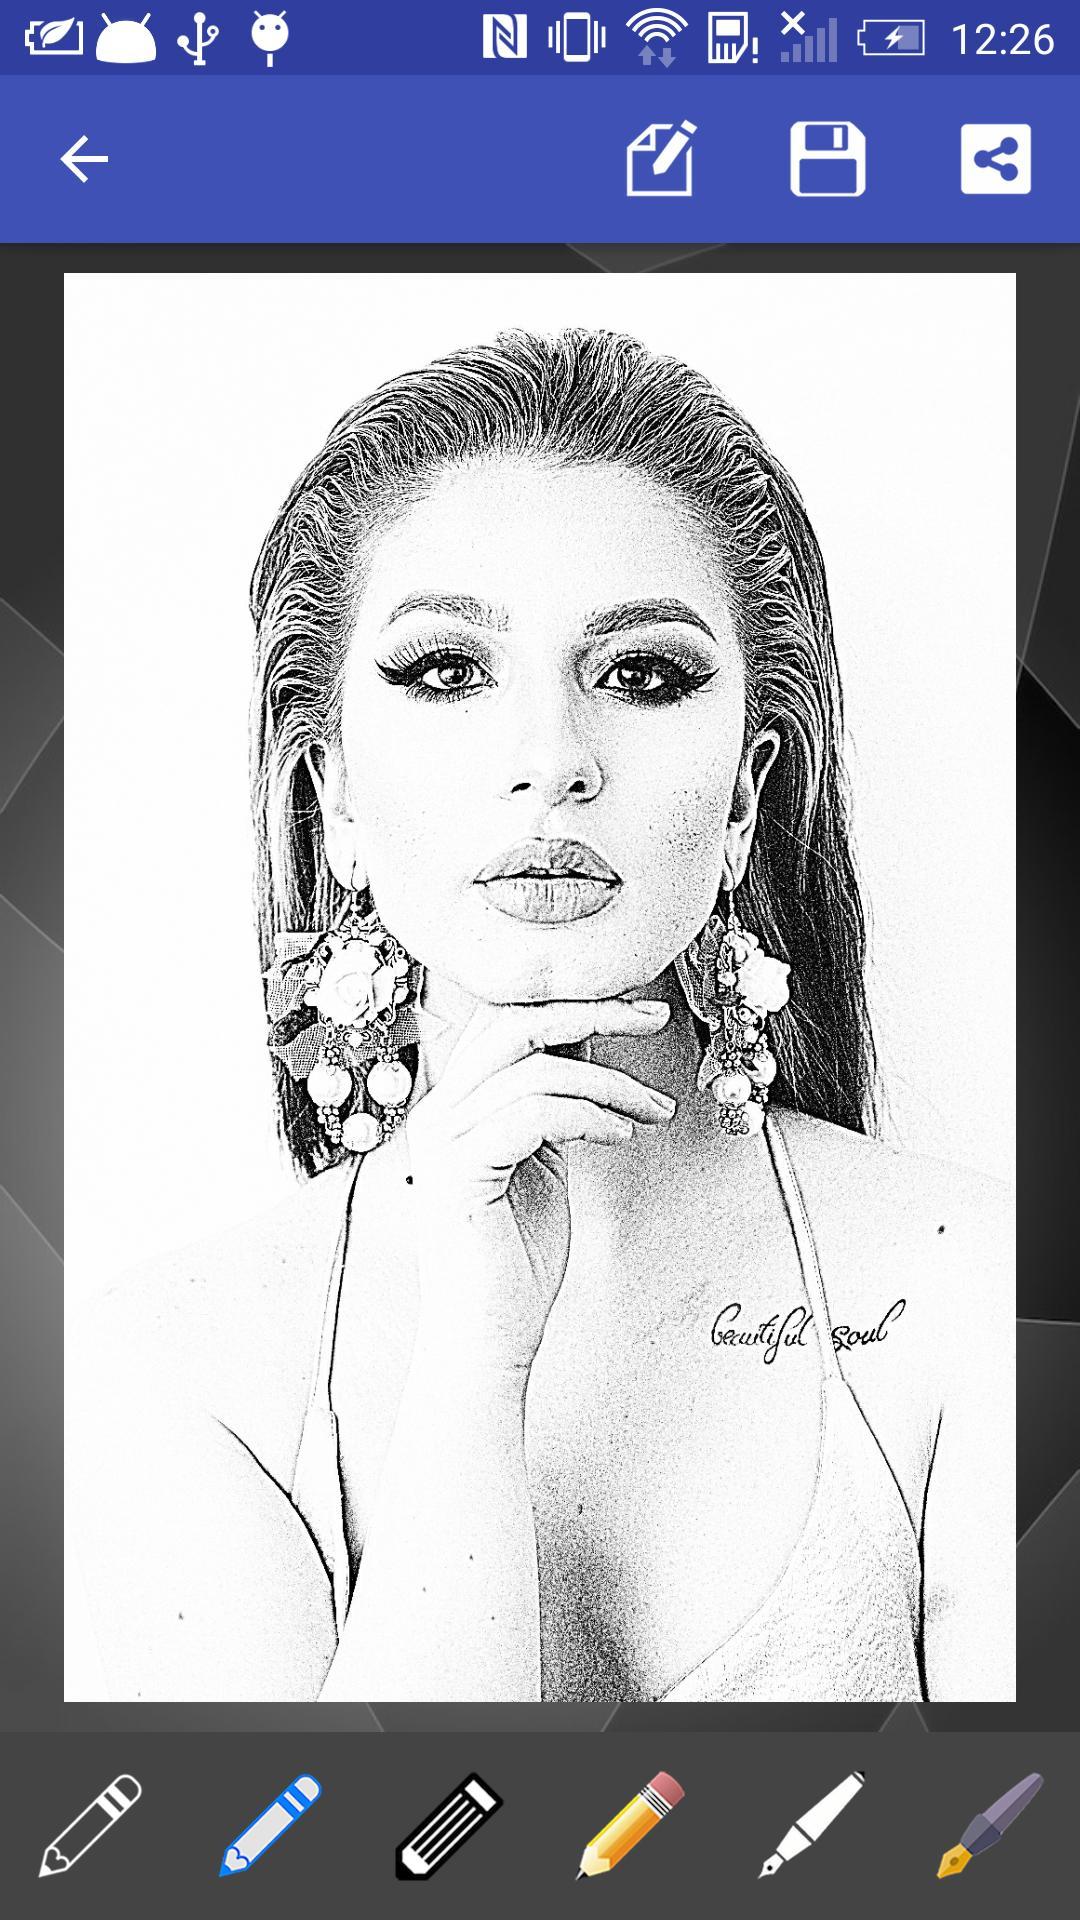 Sketsa Potret For Android APK Download